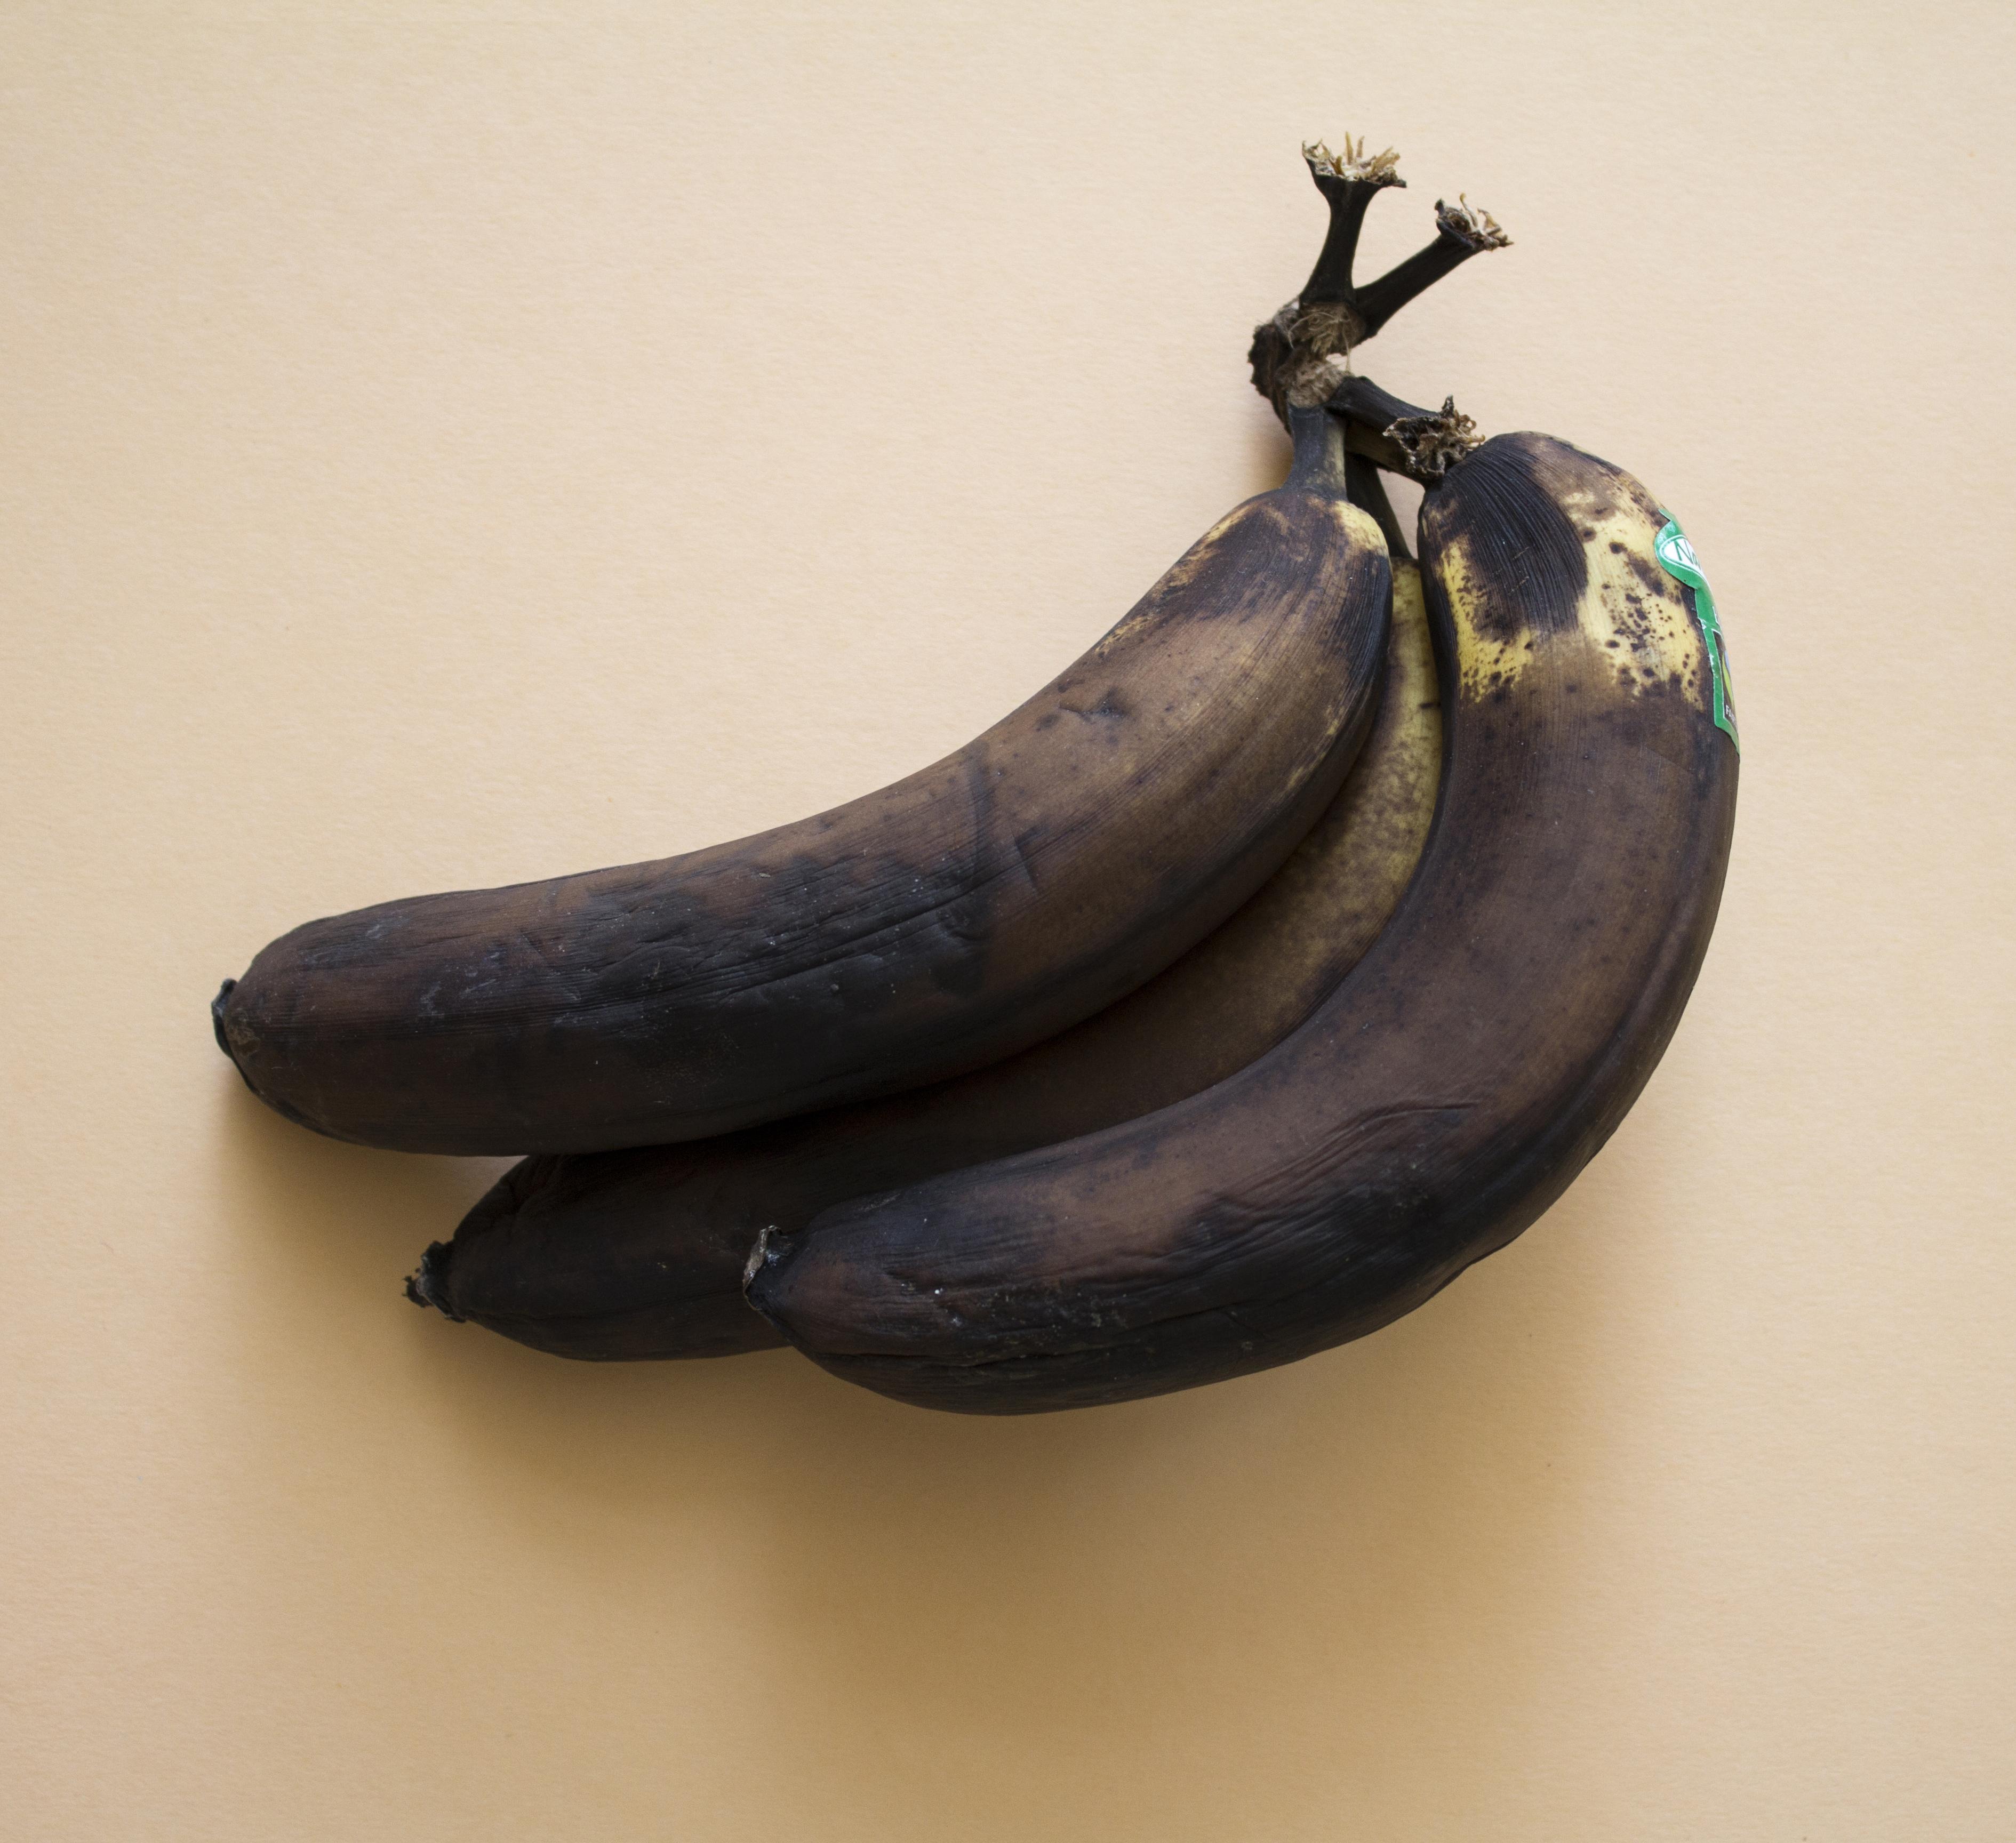 Banane_01_2532